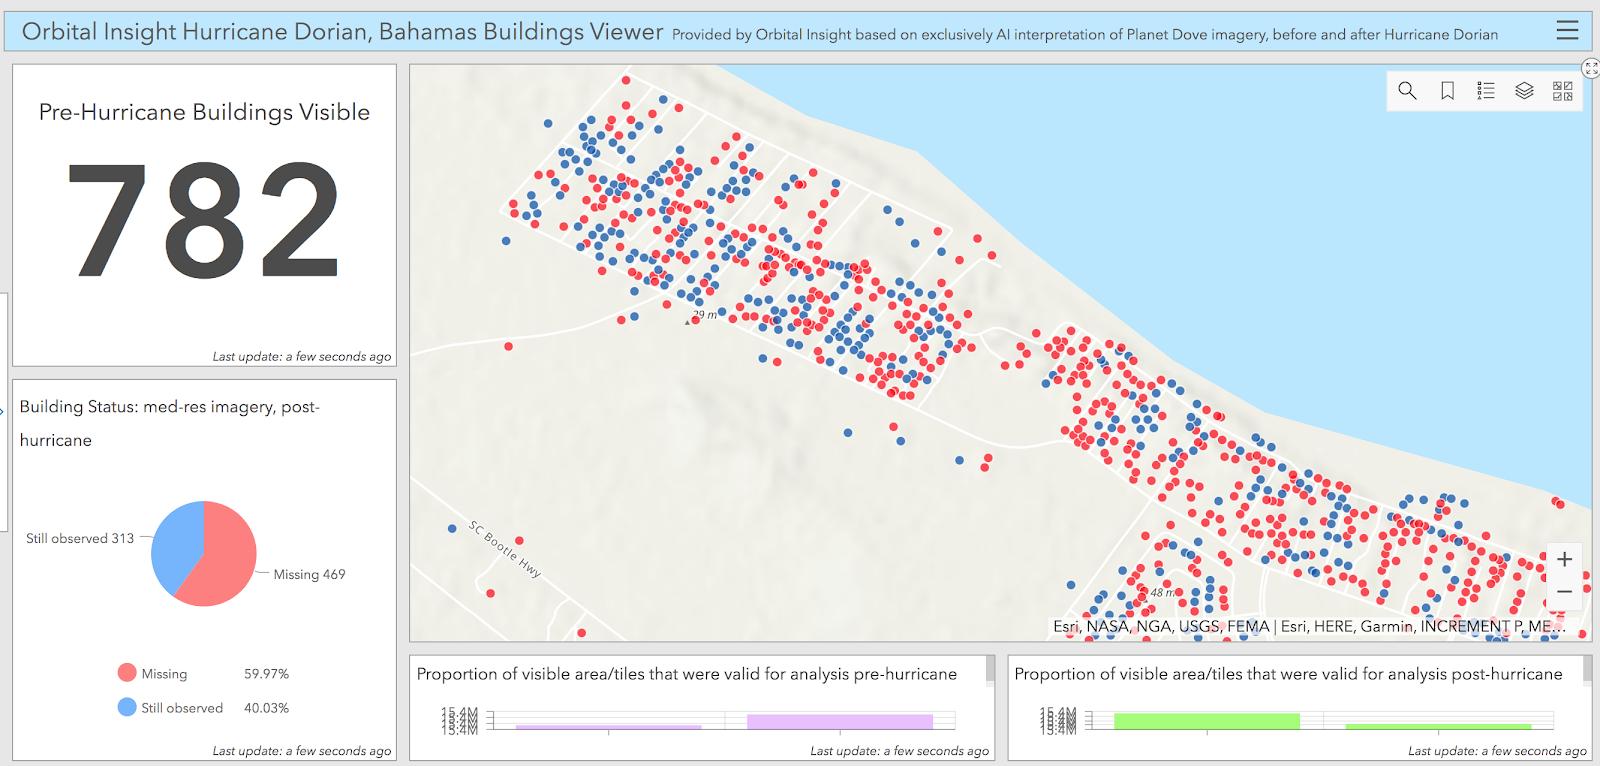 Hurricane Dorian Pre-Hurricane Buildings Visualization